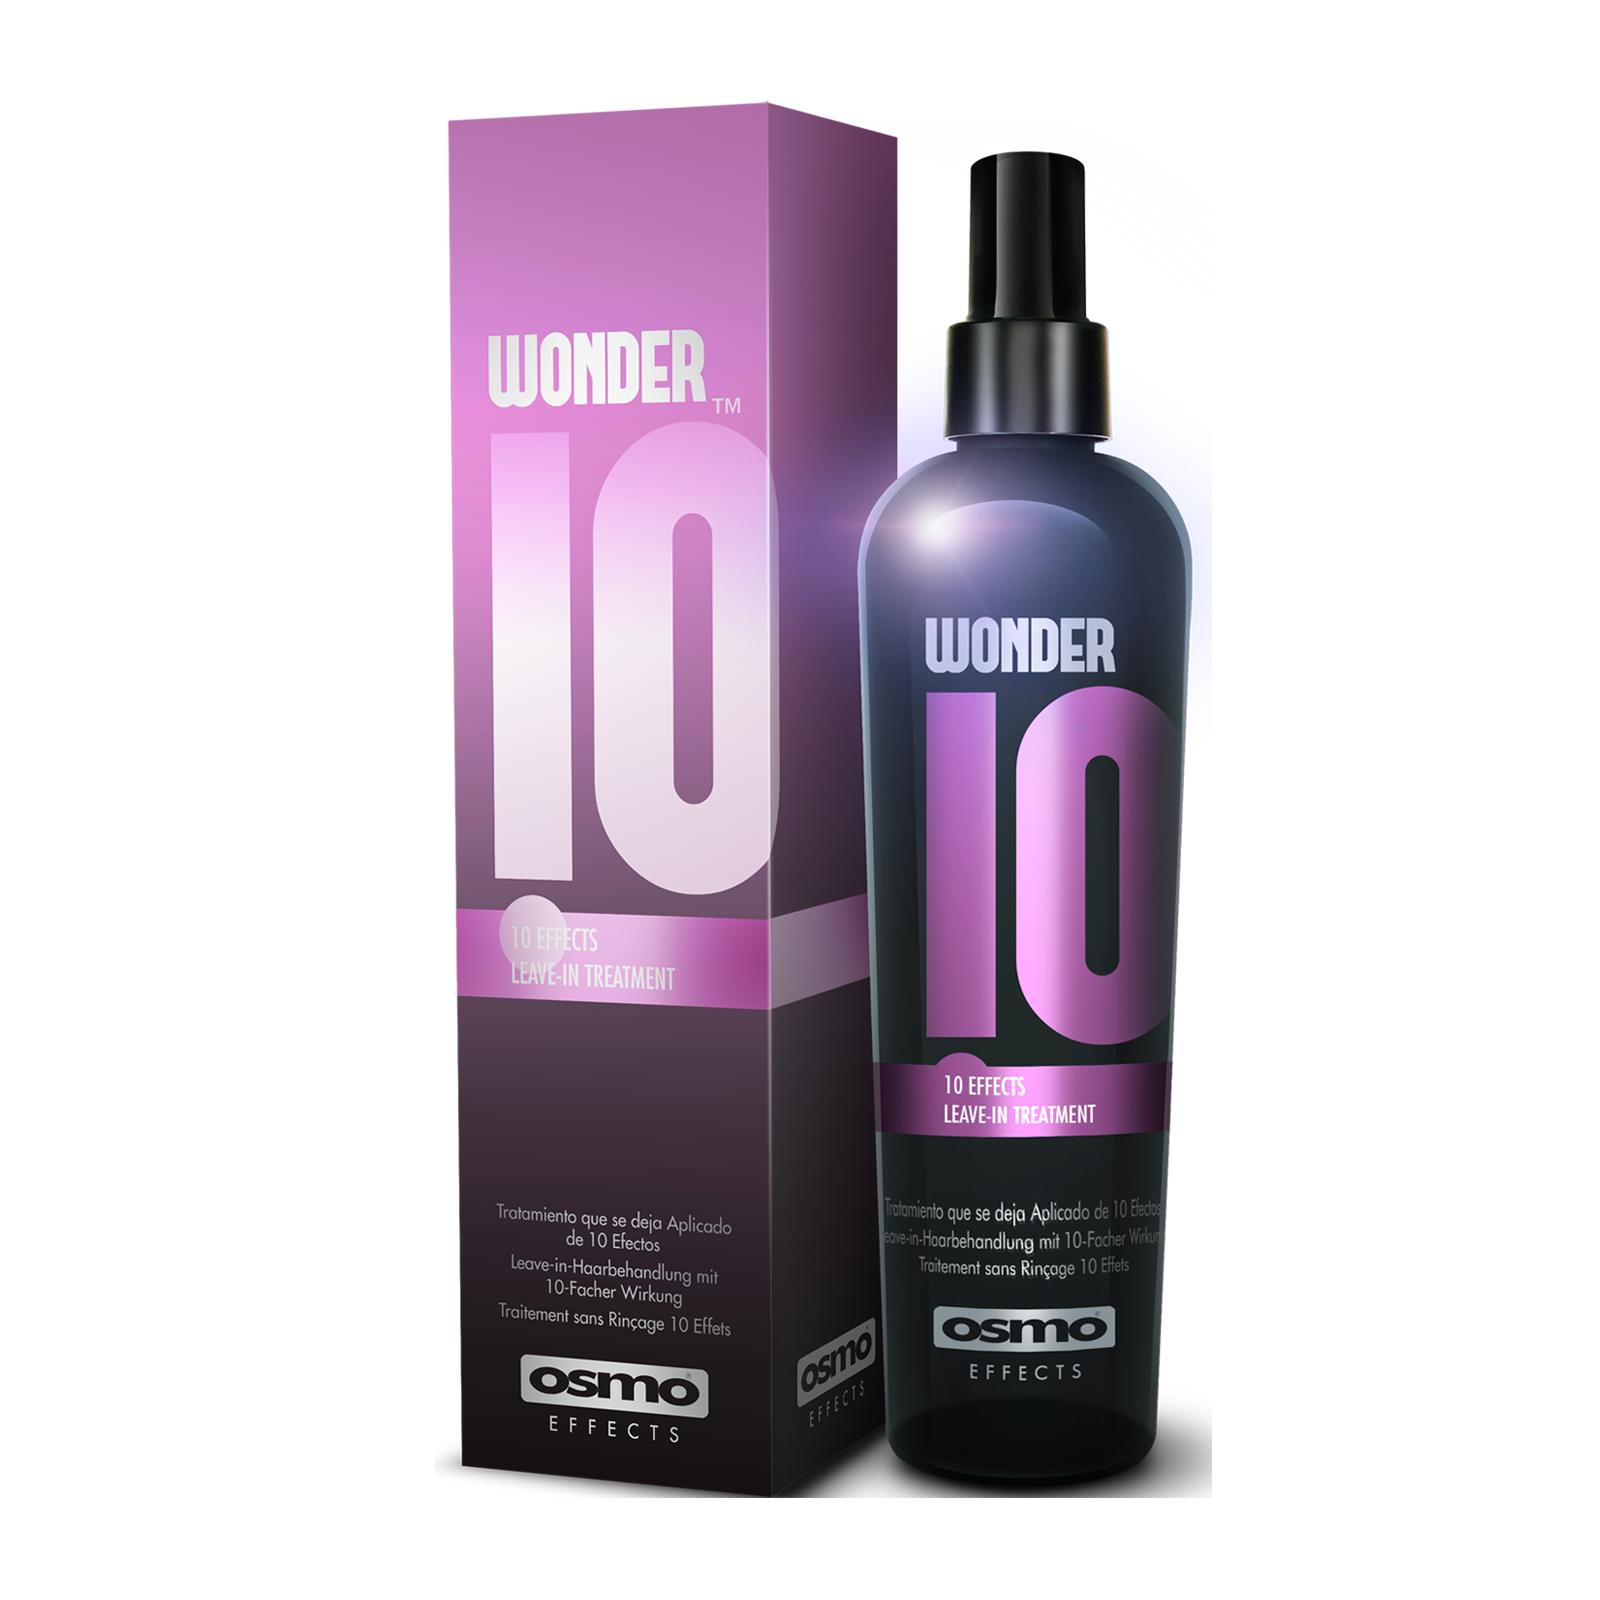 Osmo Effects Wonder 10 250ml Hair loss treatment shampoo